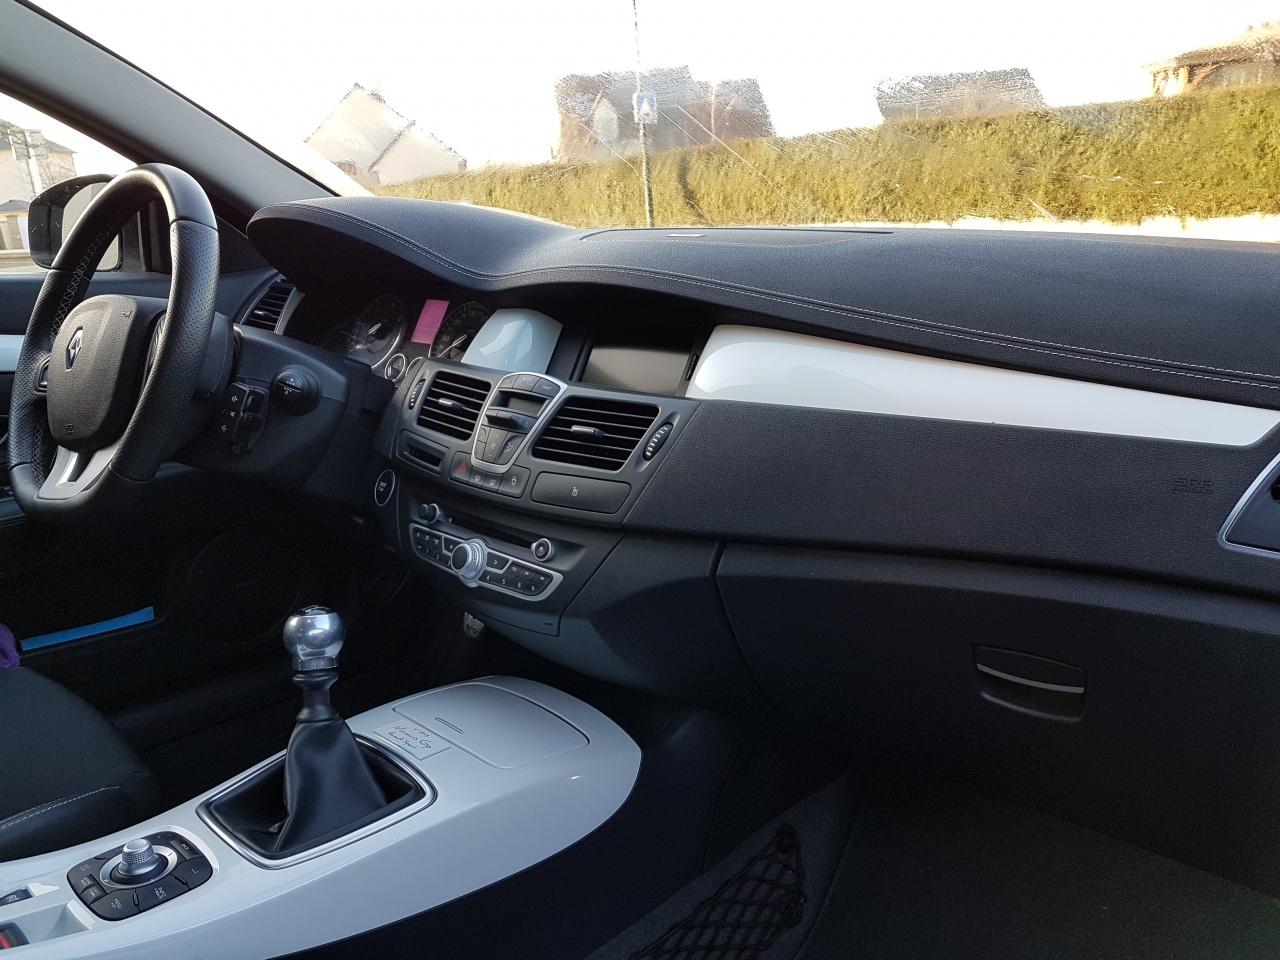 [f5sxd] Laguna III.2 Coupé 150cv Monaco Gp 76083420170102155607